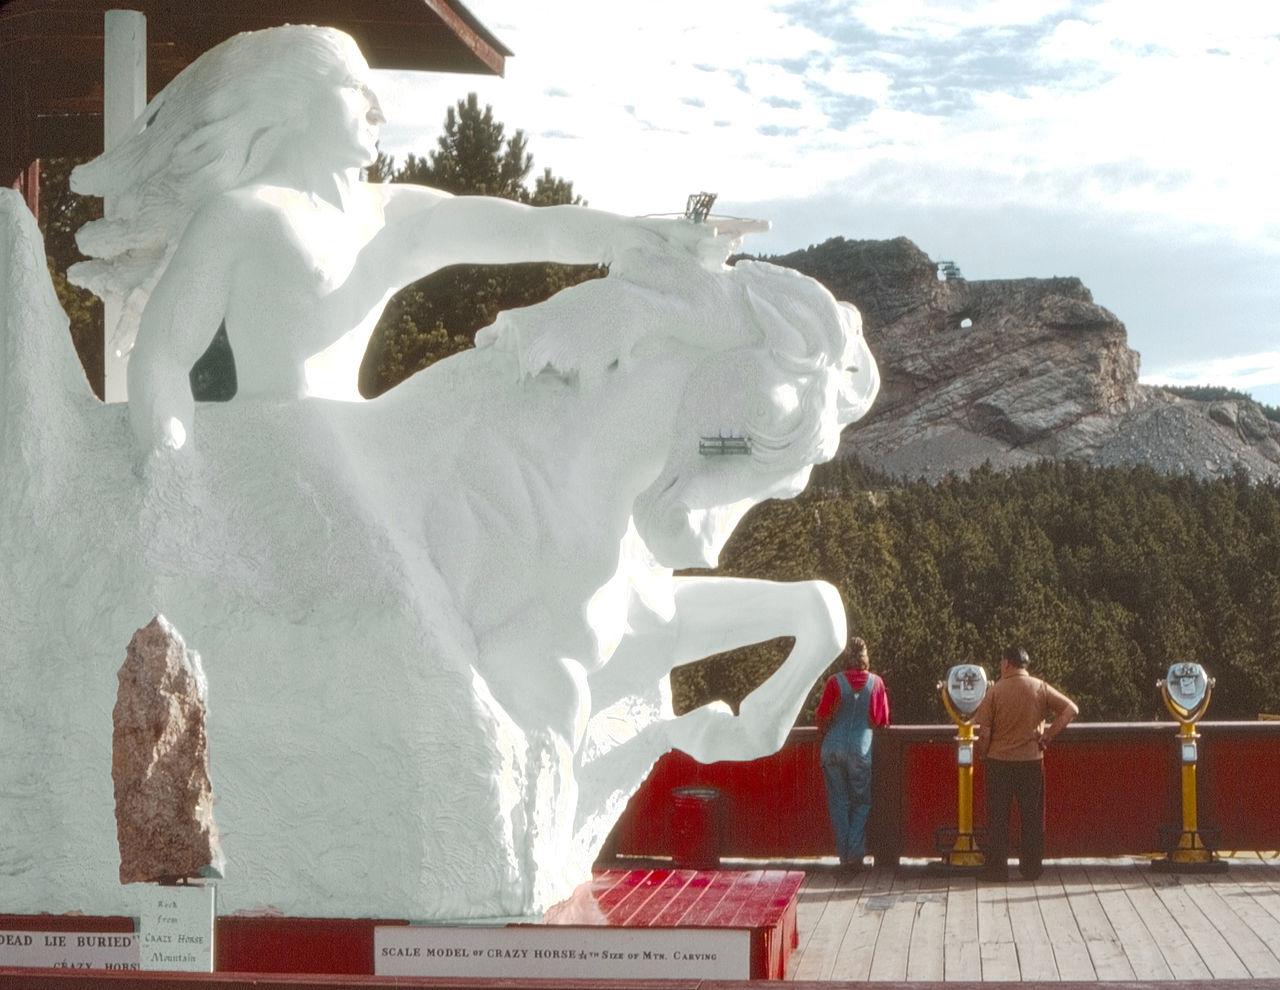 Crazy_Horse_Memorial_Model